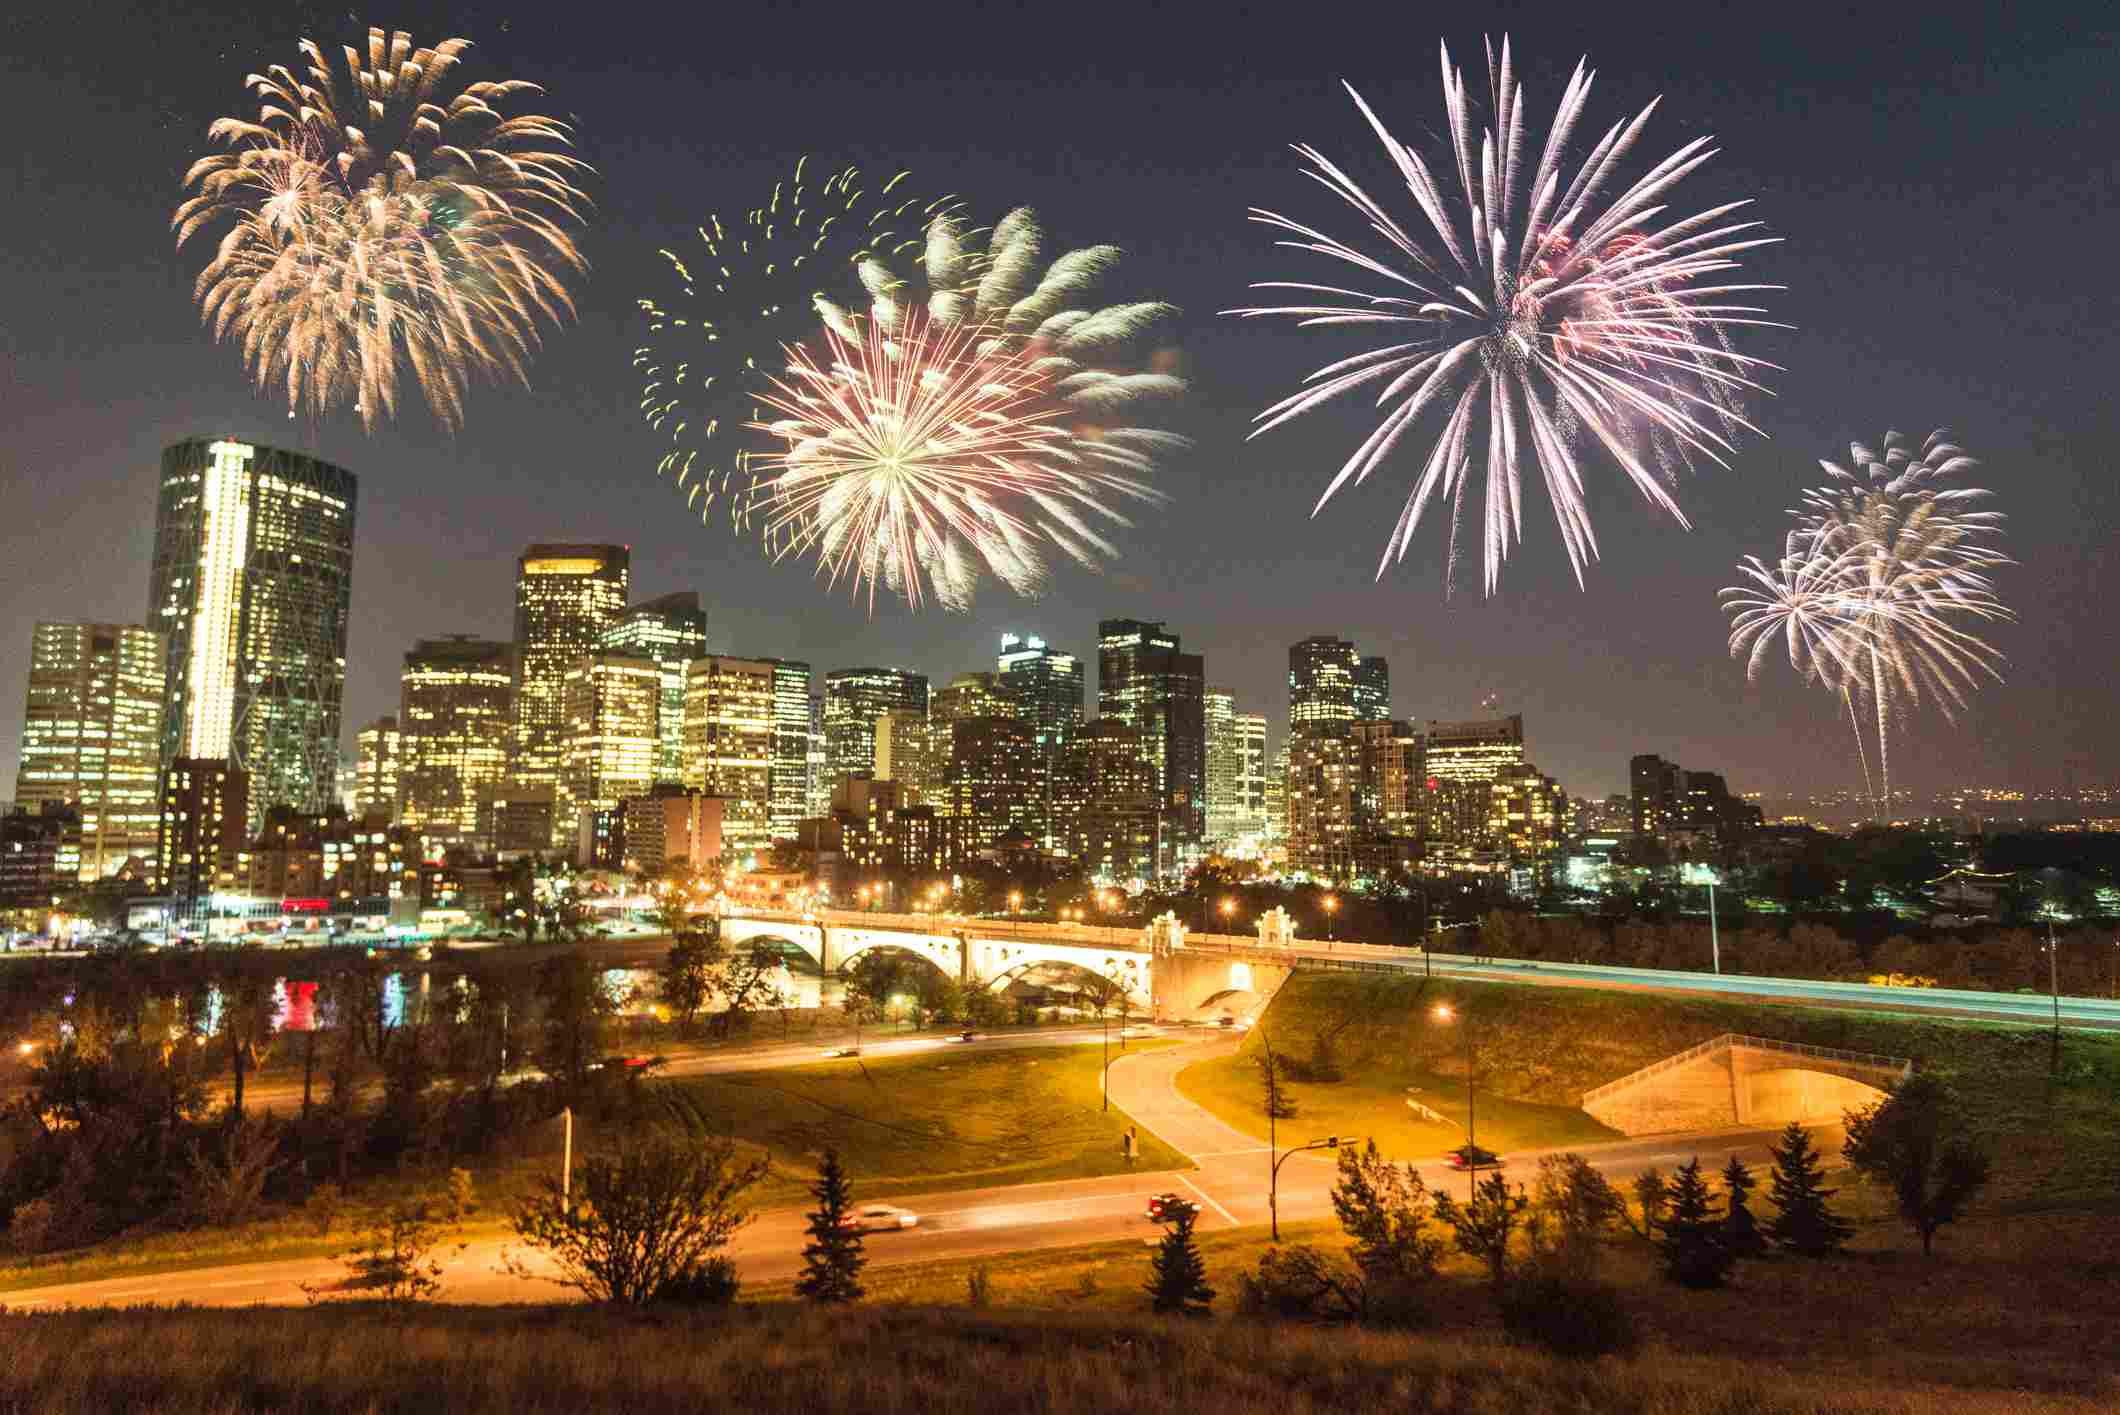 New Years fireworks celebrations in Calgary, Alberta